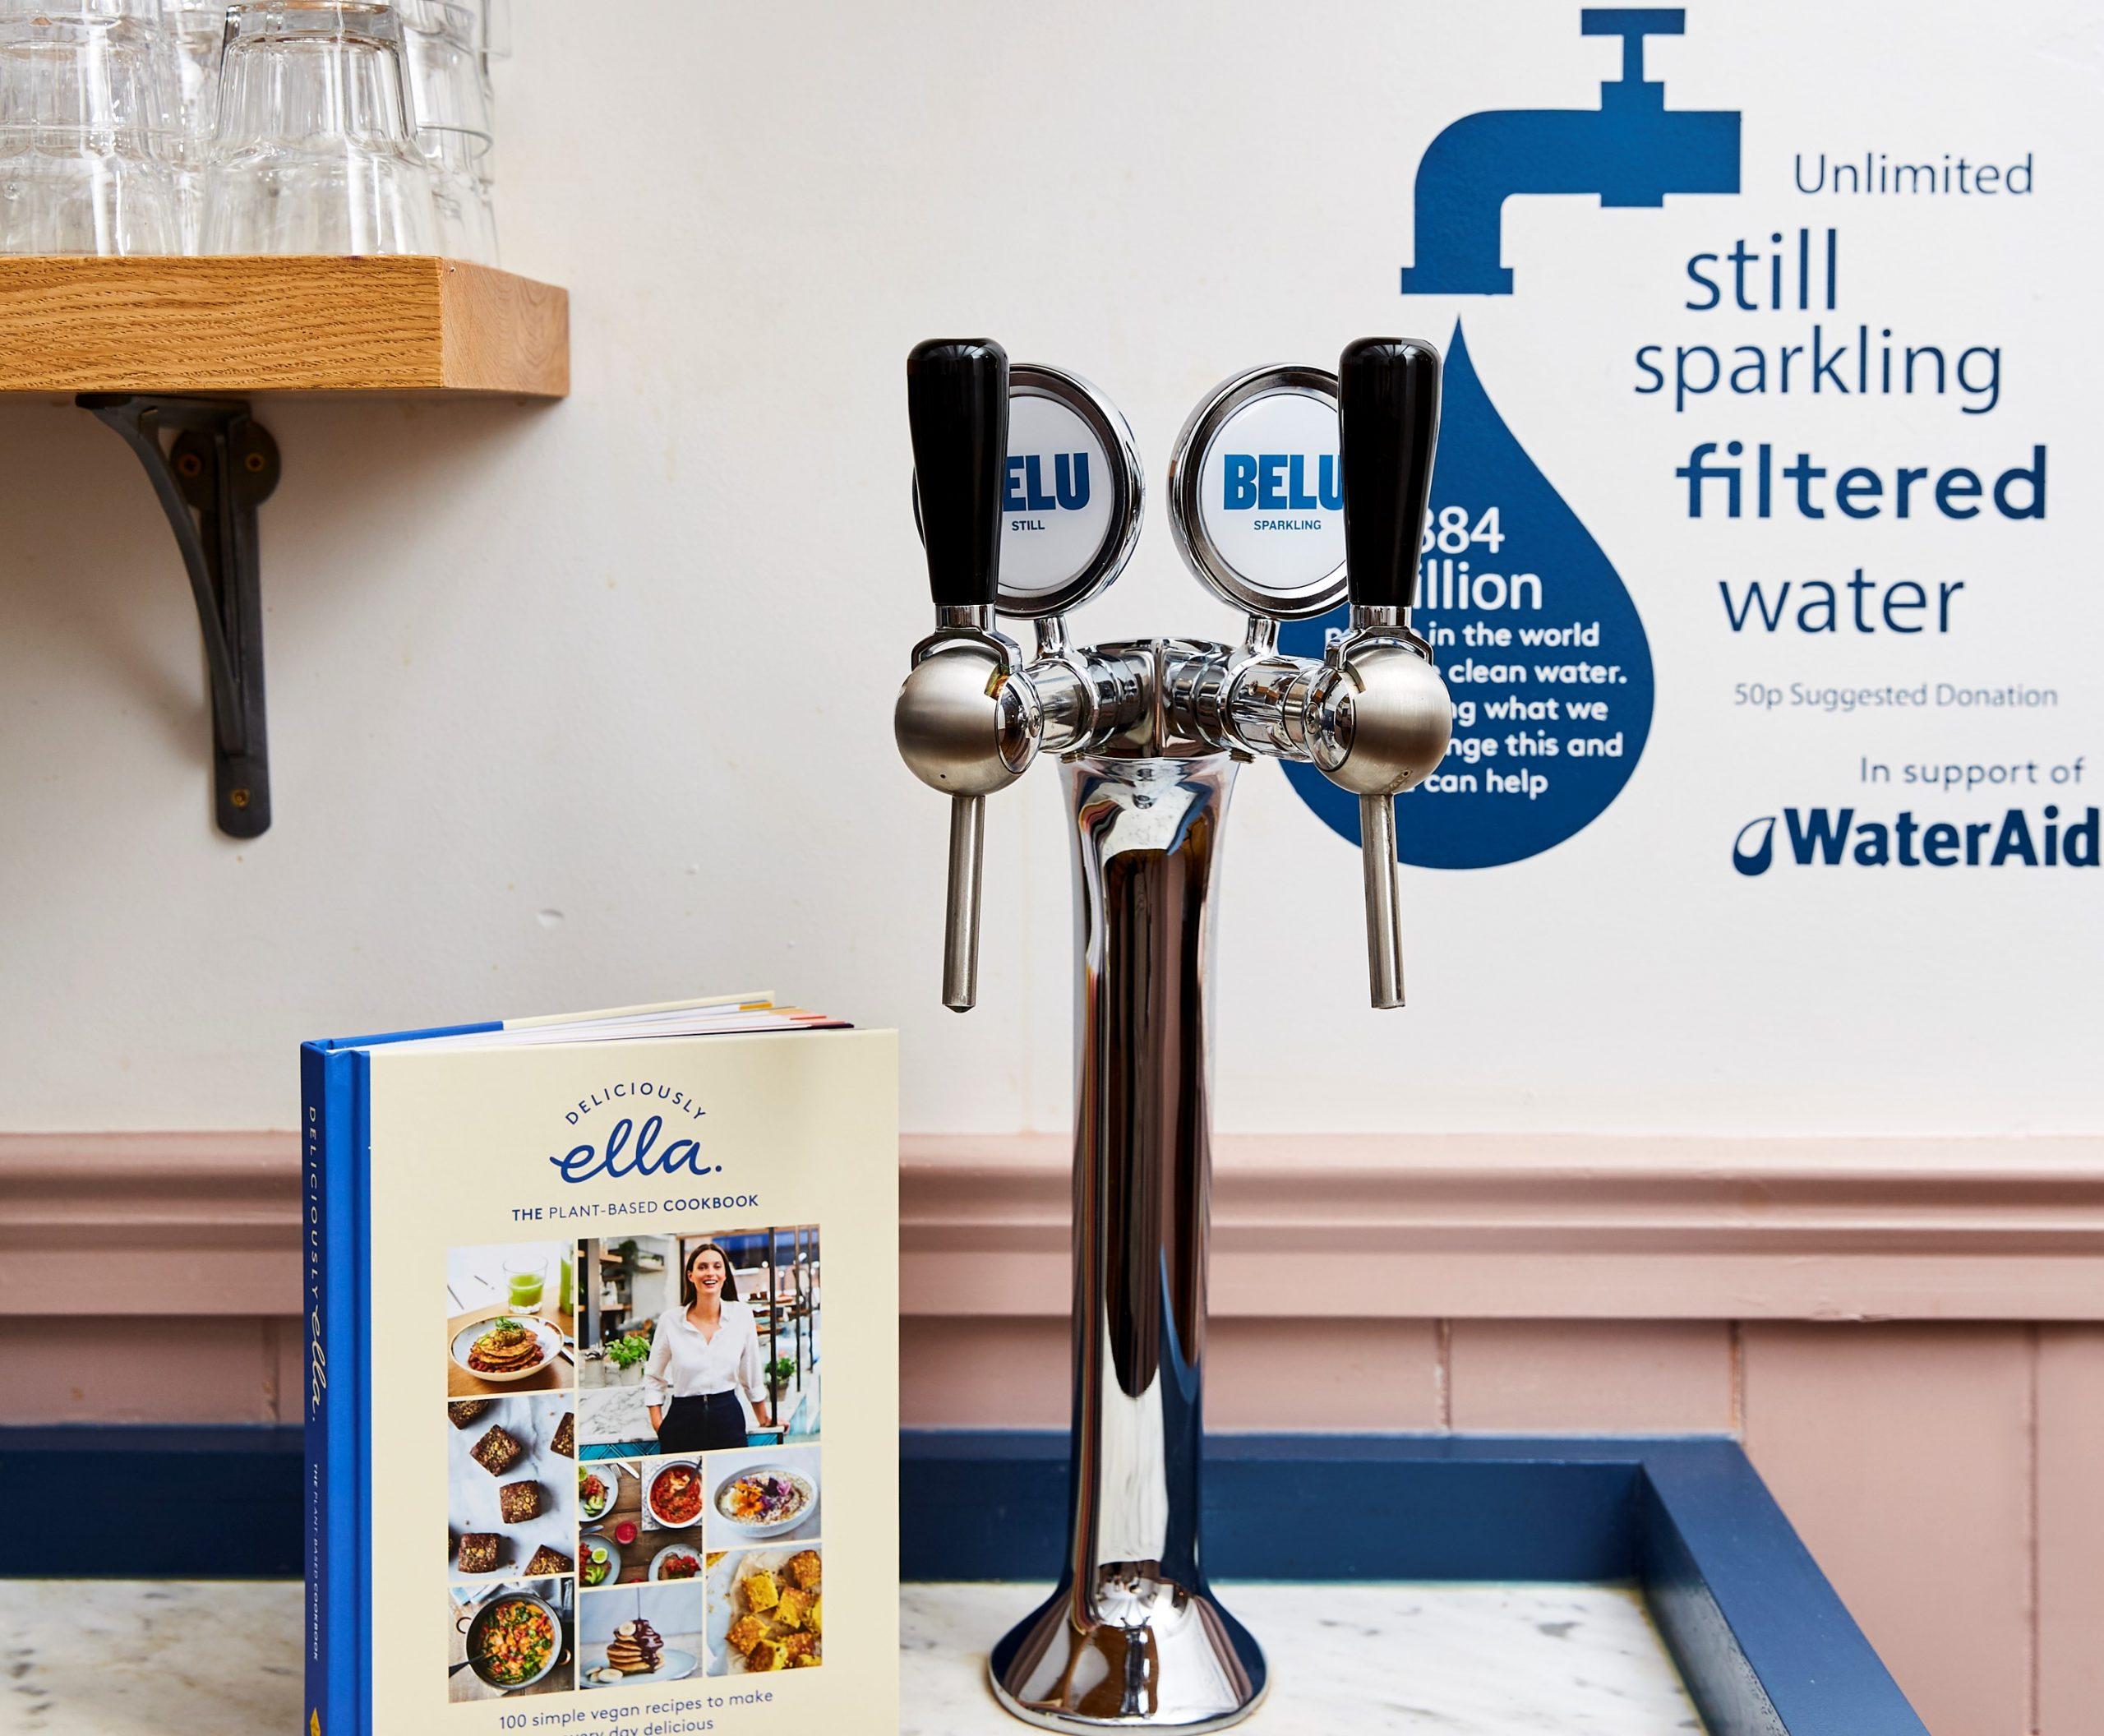 Belu filtration system at Deliciously Ella